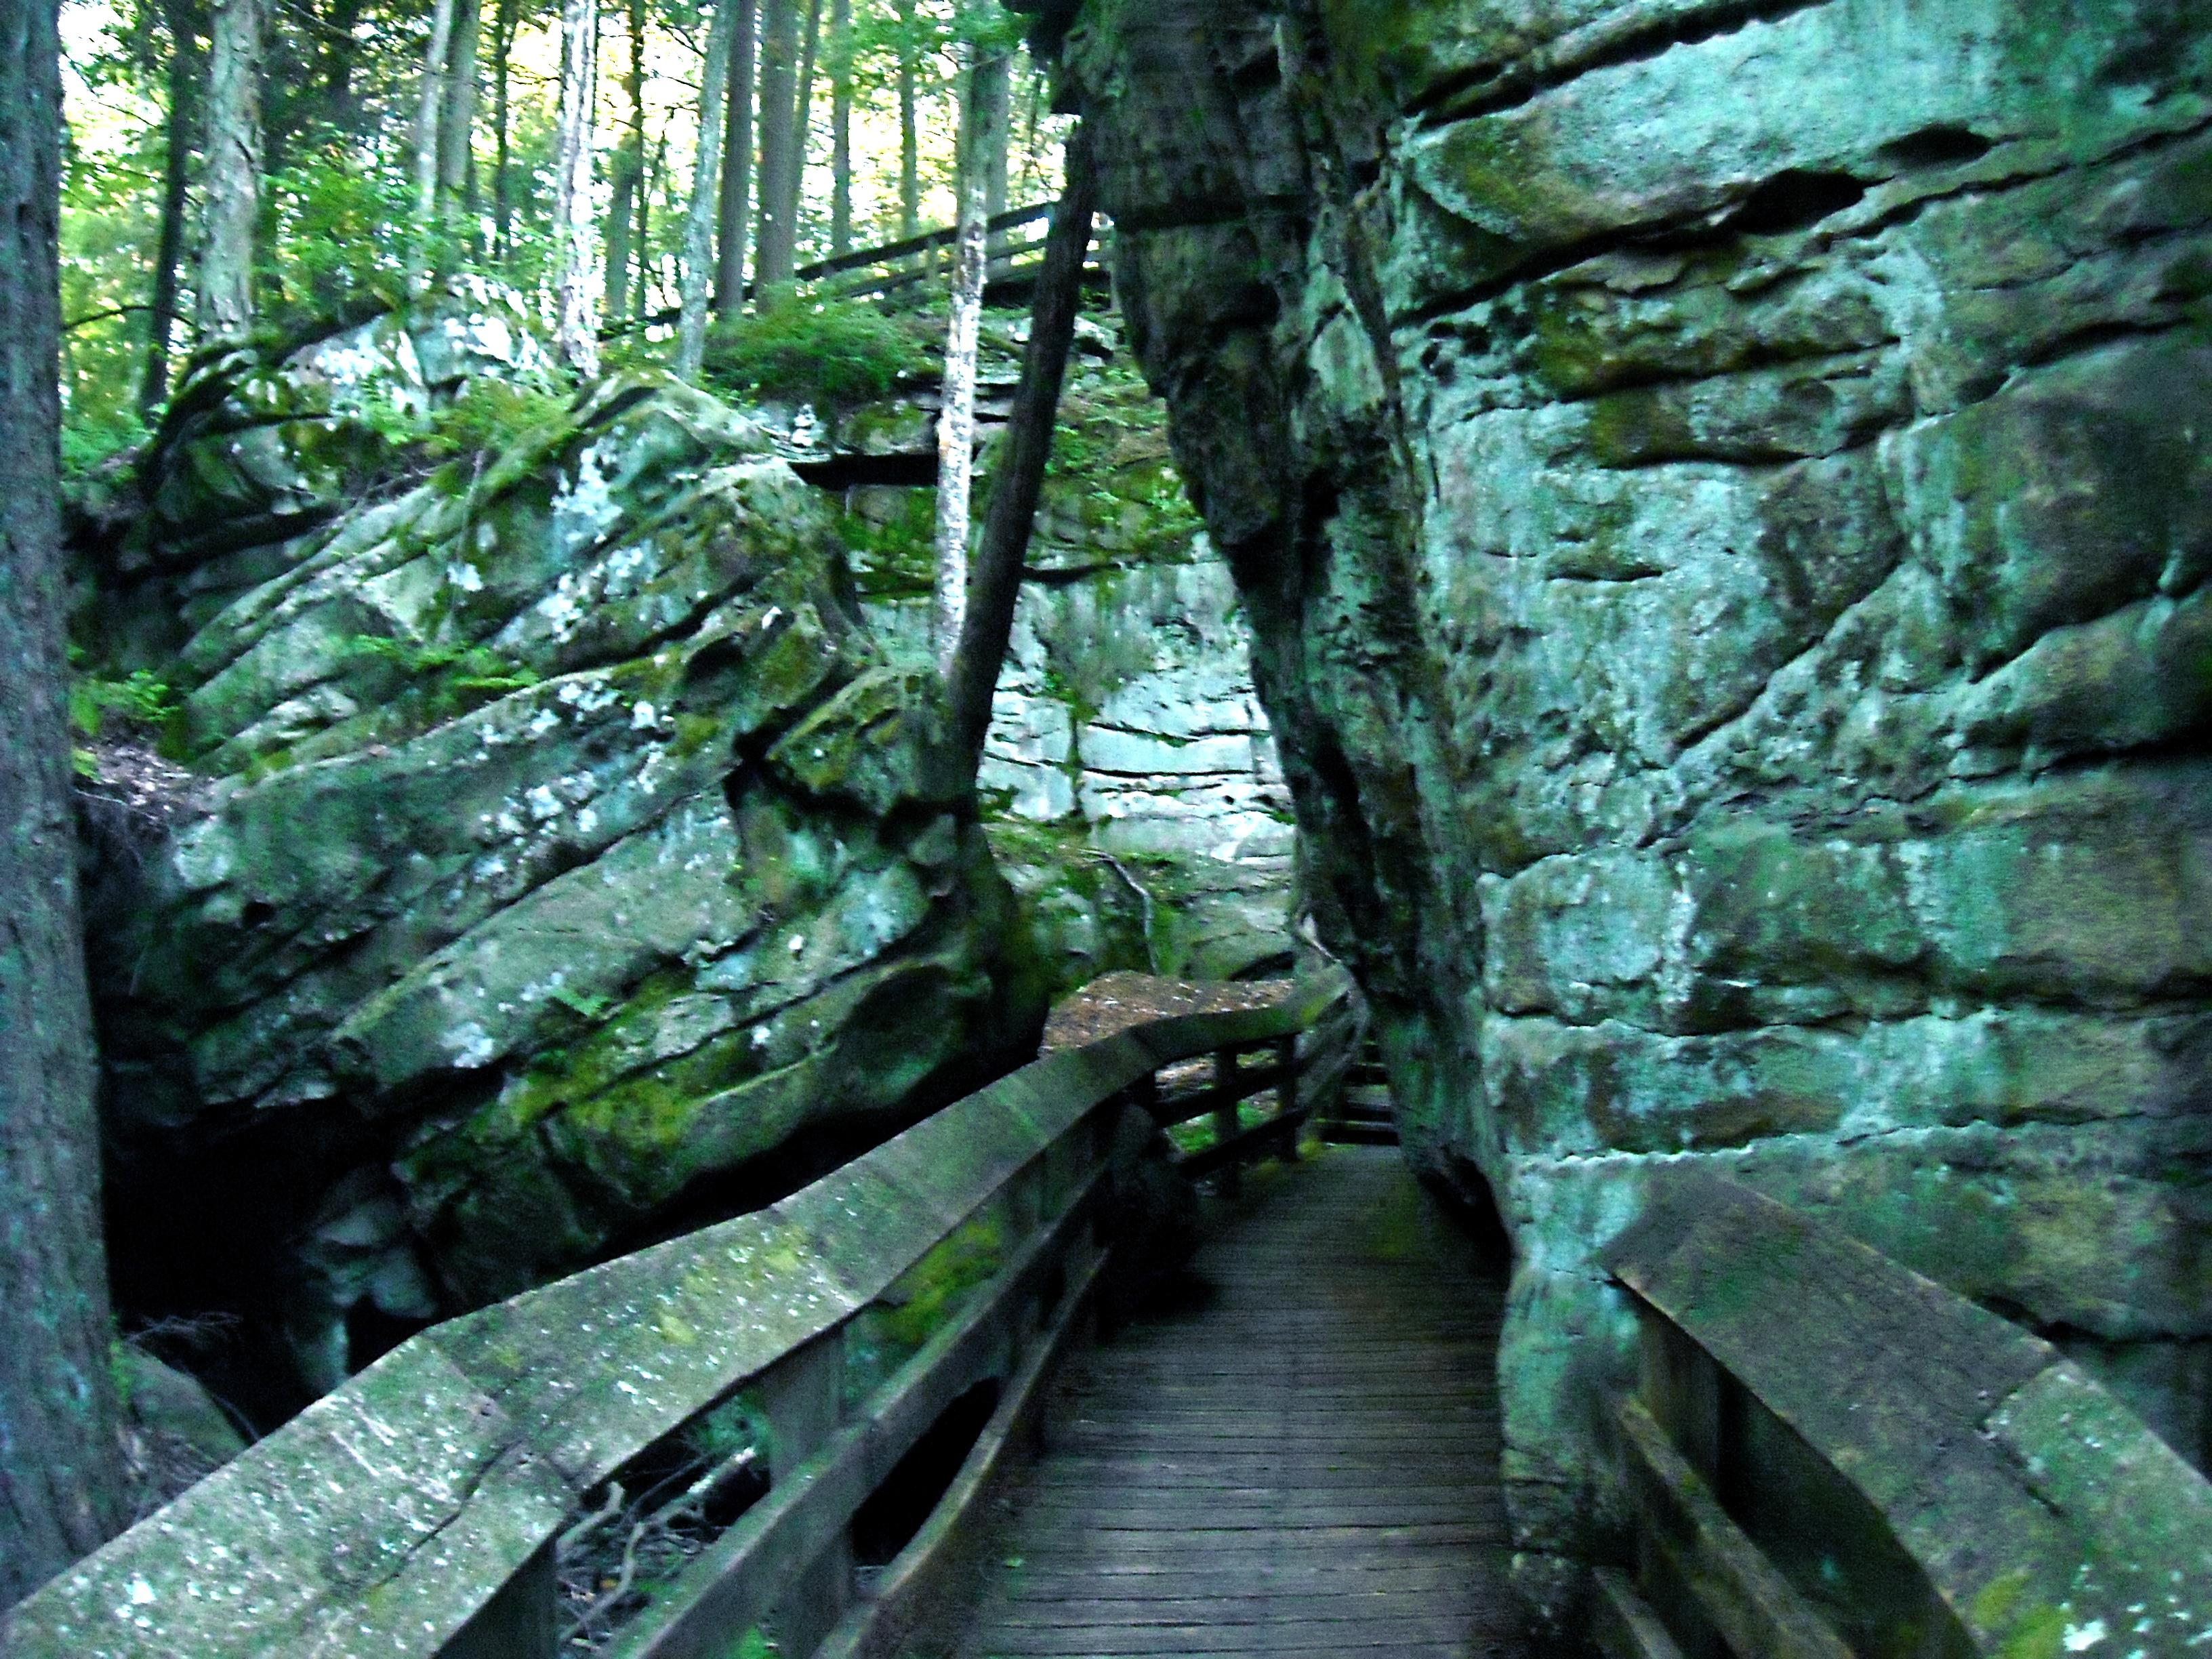 Beartown state park monongahellyeah - Towne place at garden state park ...